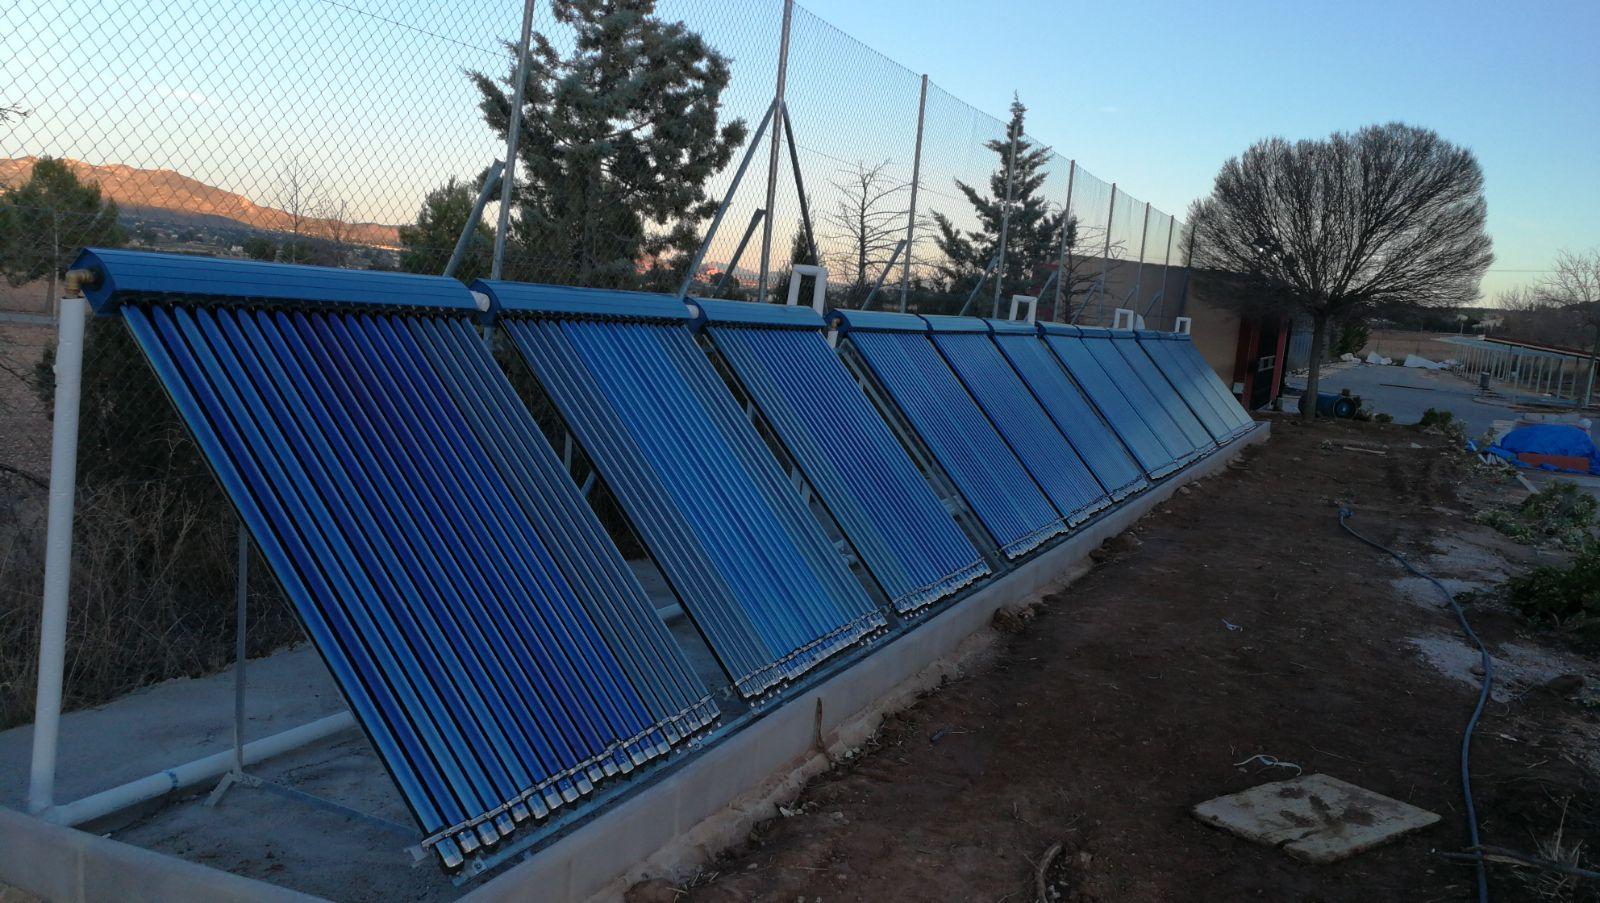 Instalación de energía solar térmica con captadores tubo de vacío heat pipe para producción de ACS